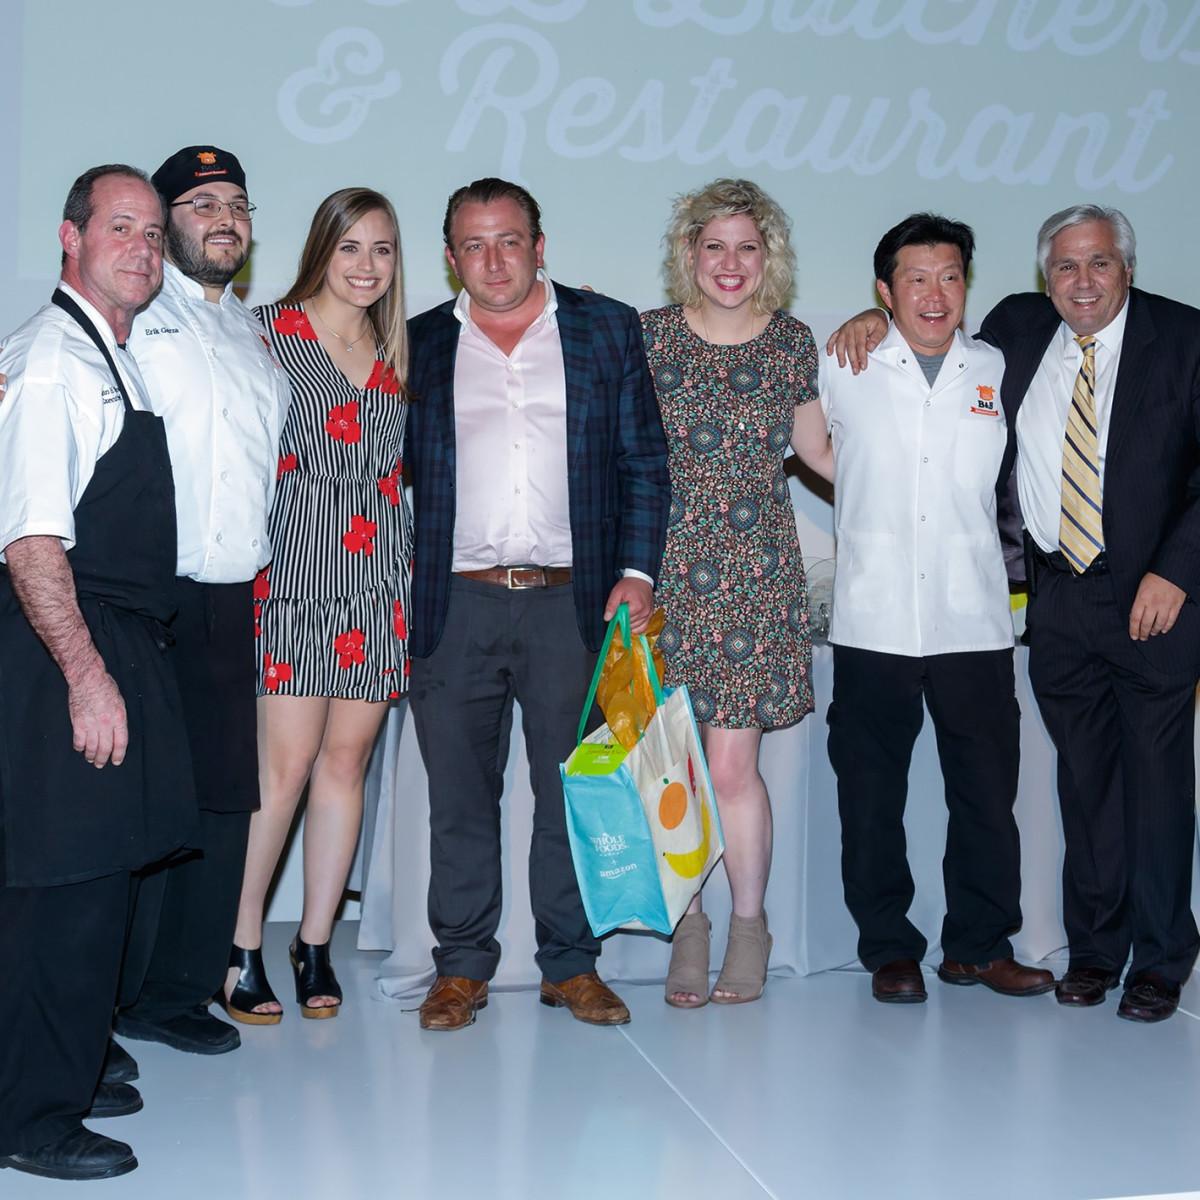 Dallas Tastemaker Awards 2018, BBButchers, Best New Restaurant Fort Worth